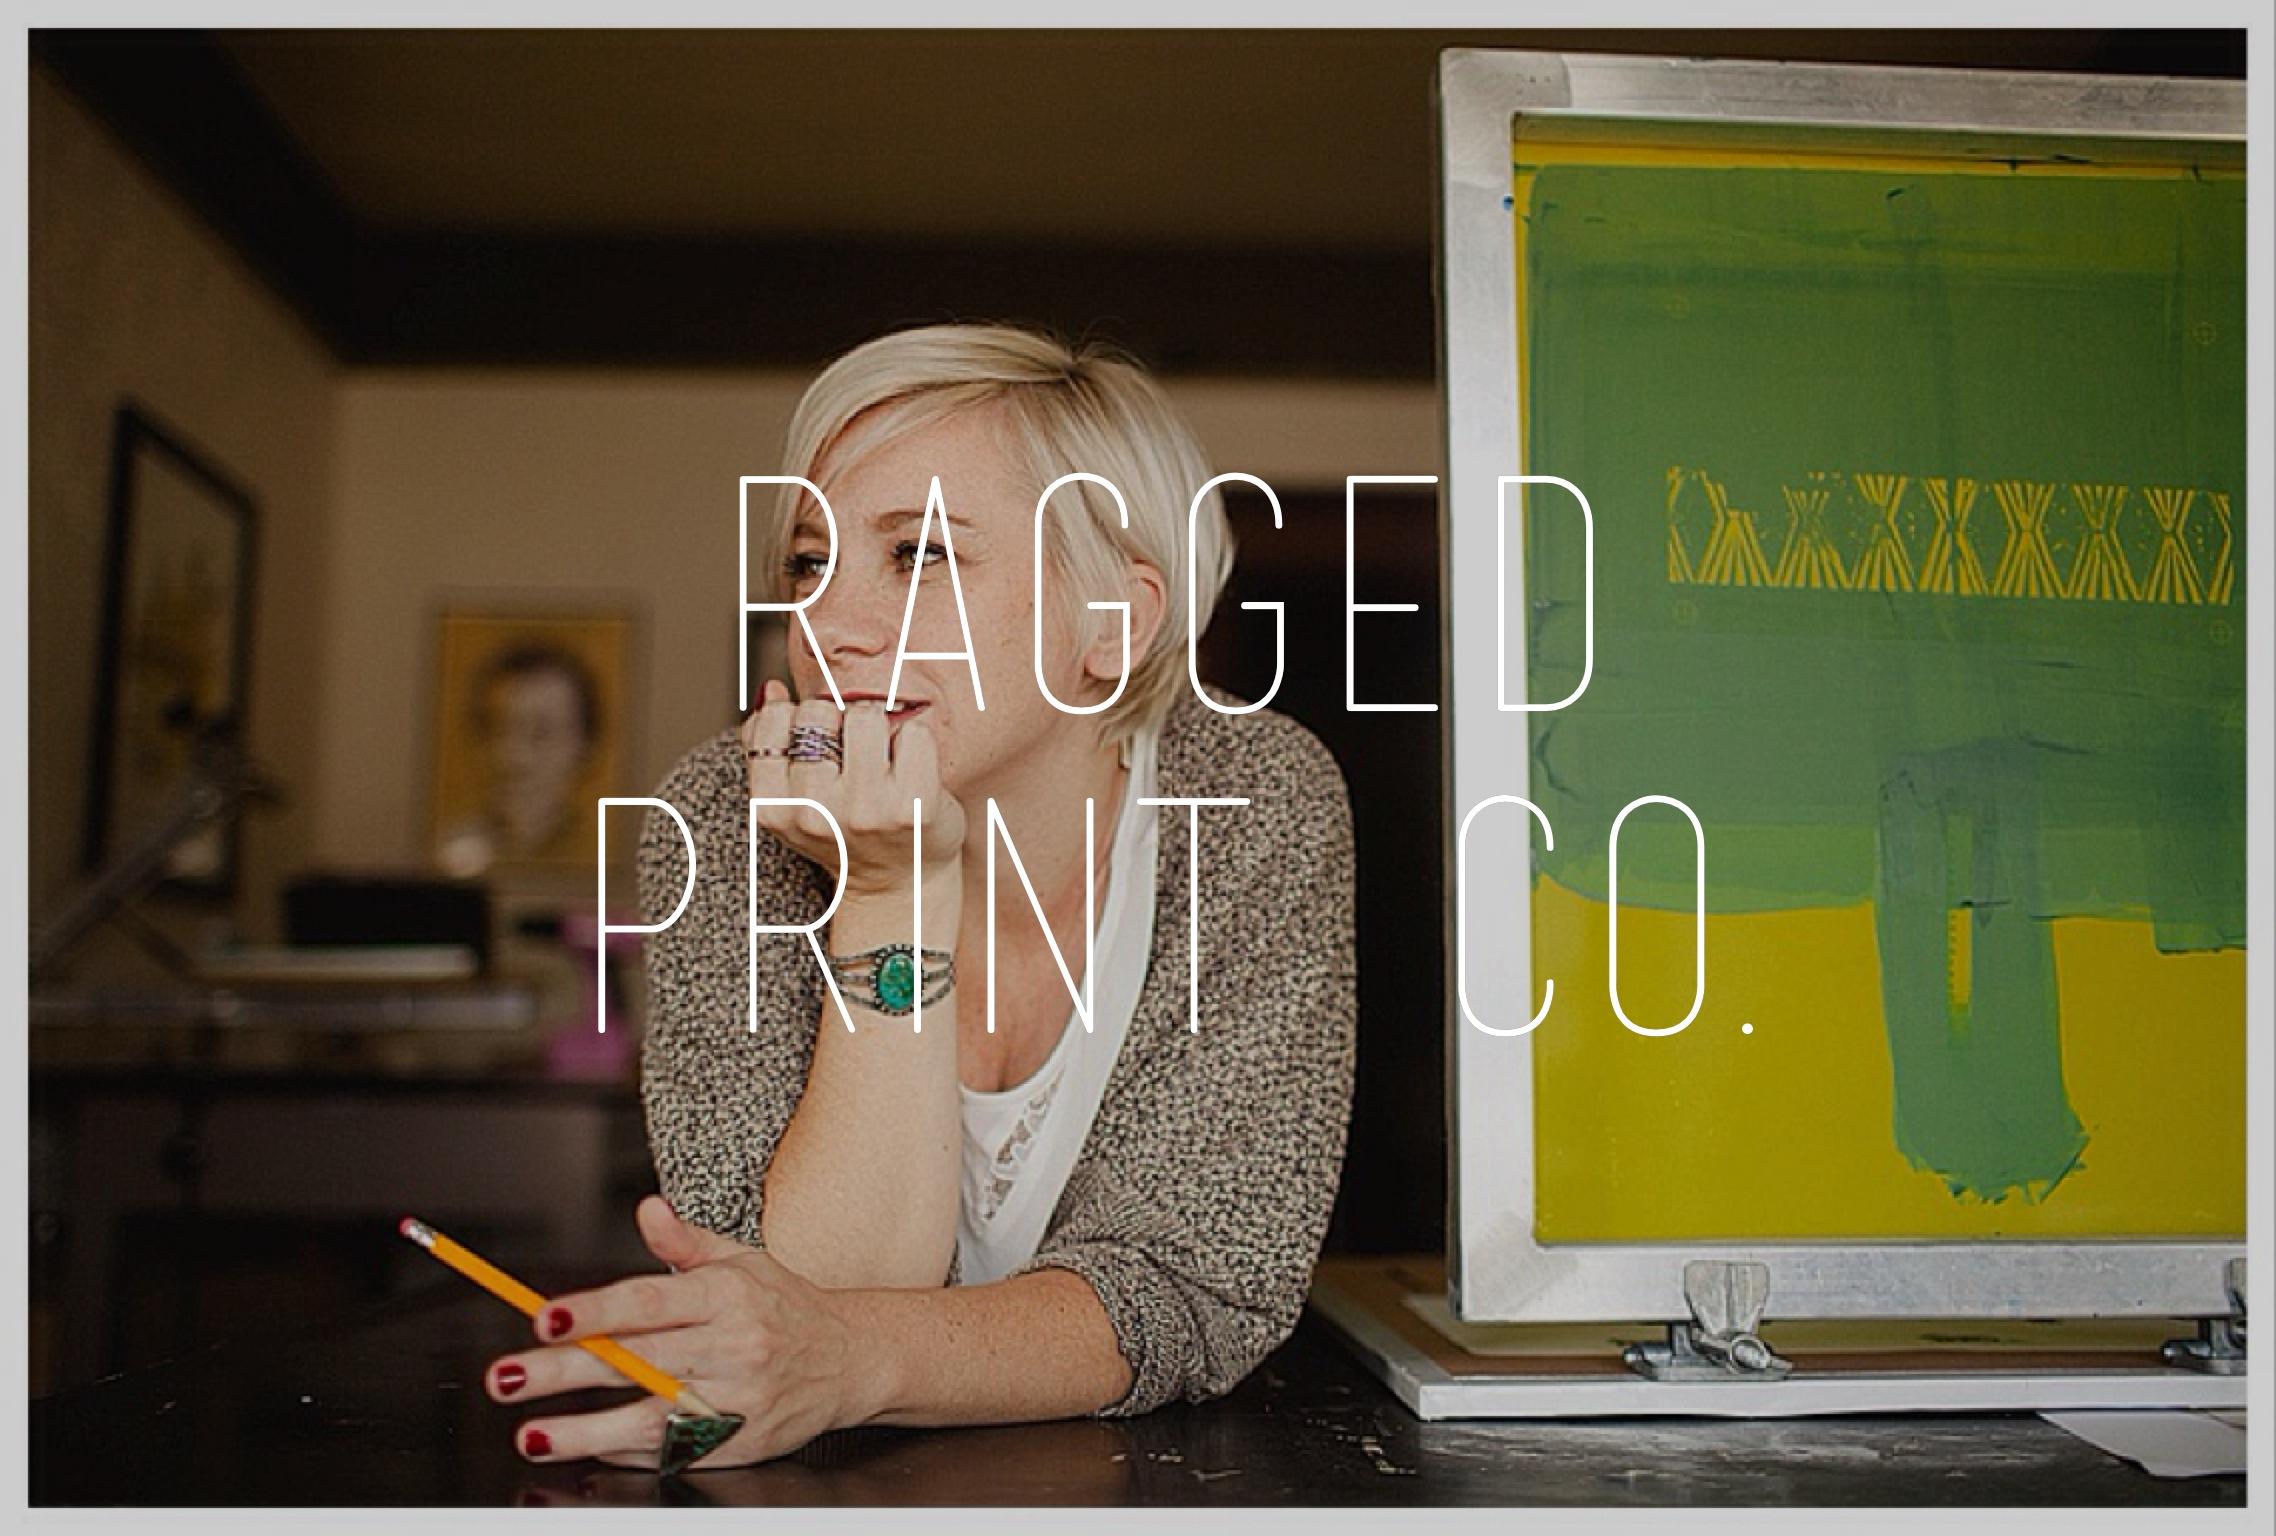 Ragged Print CO.